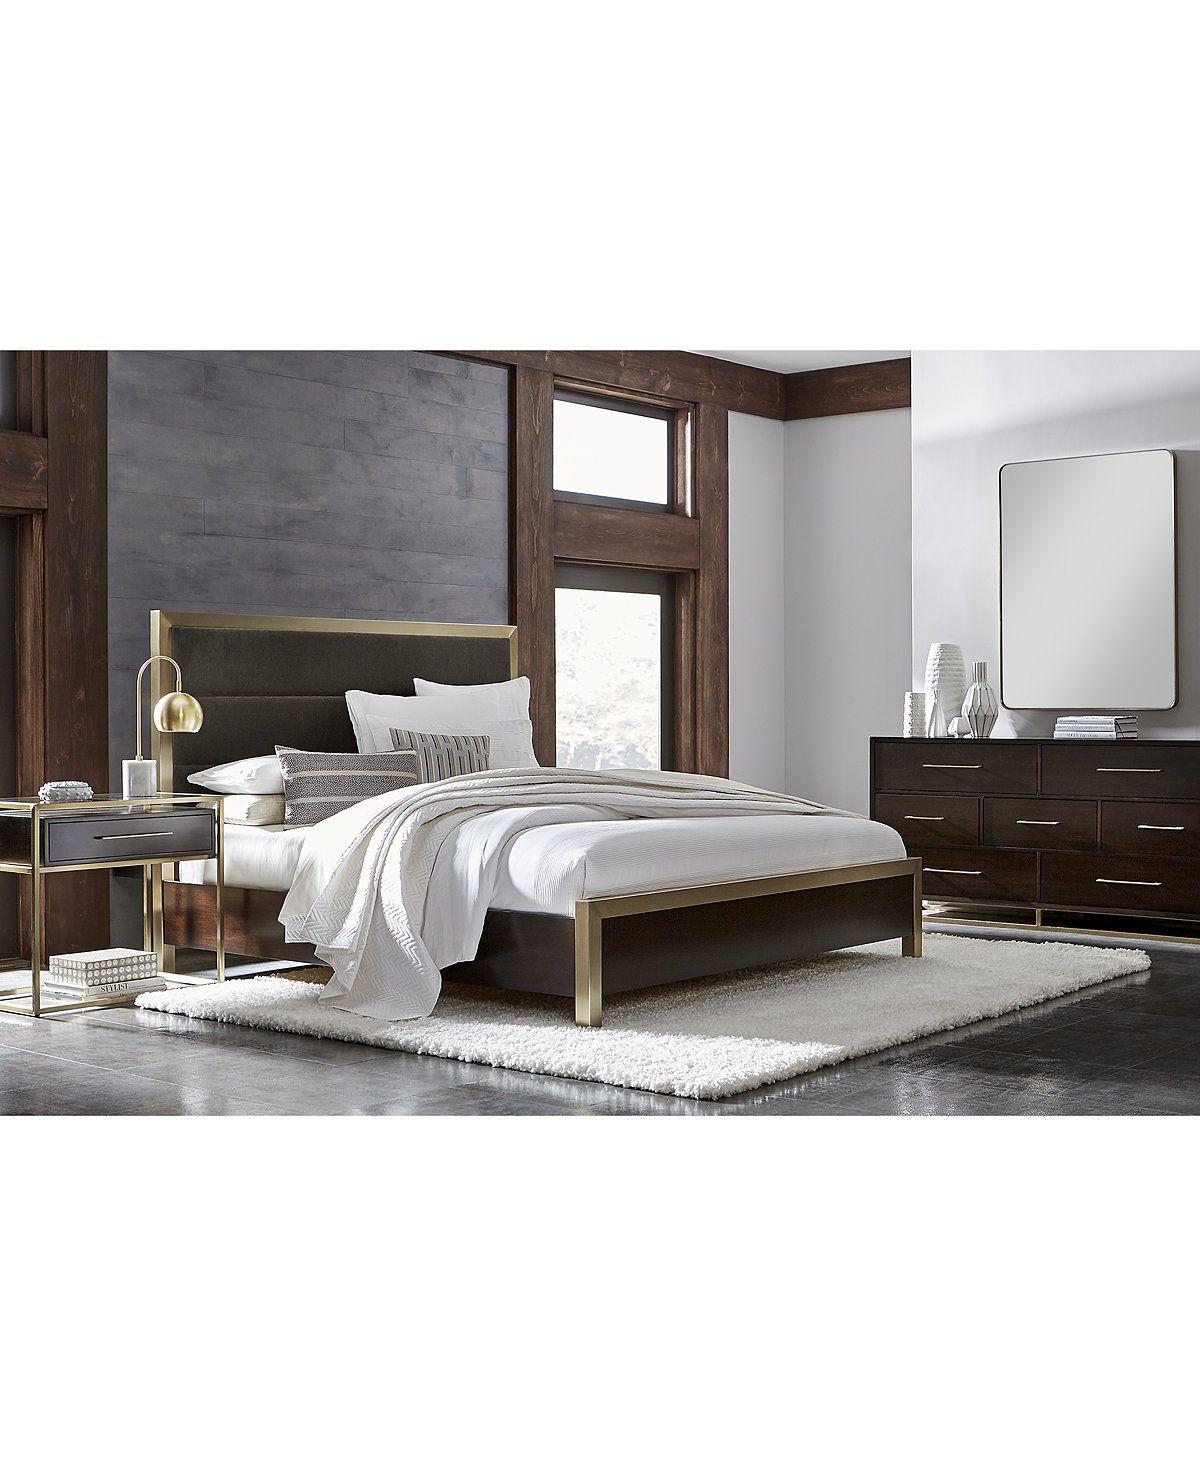 68+ Macys Modern Bedroom Sets Best Free